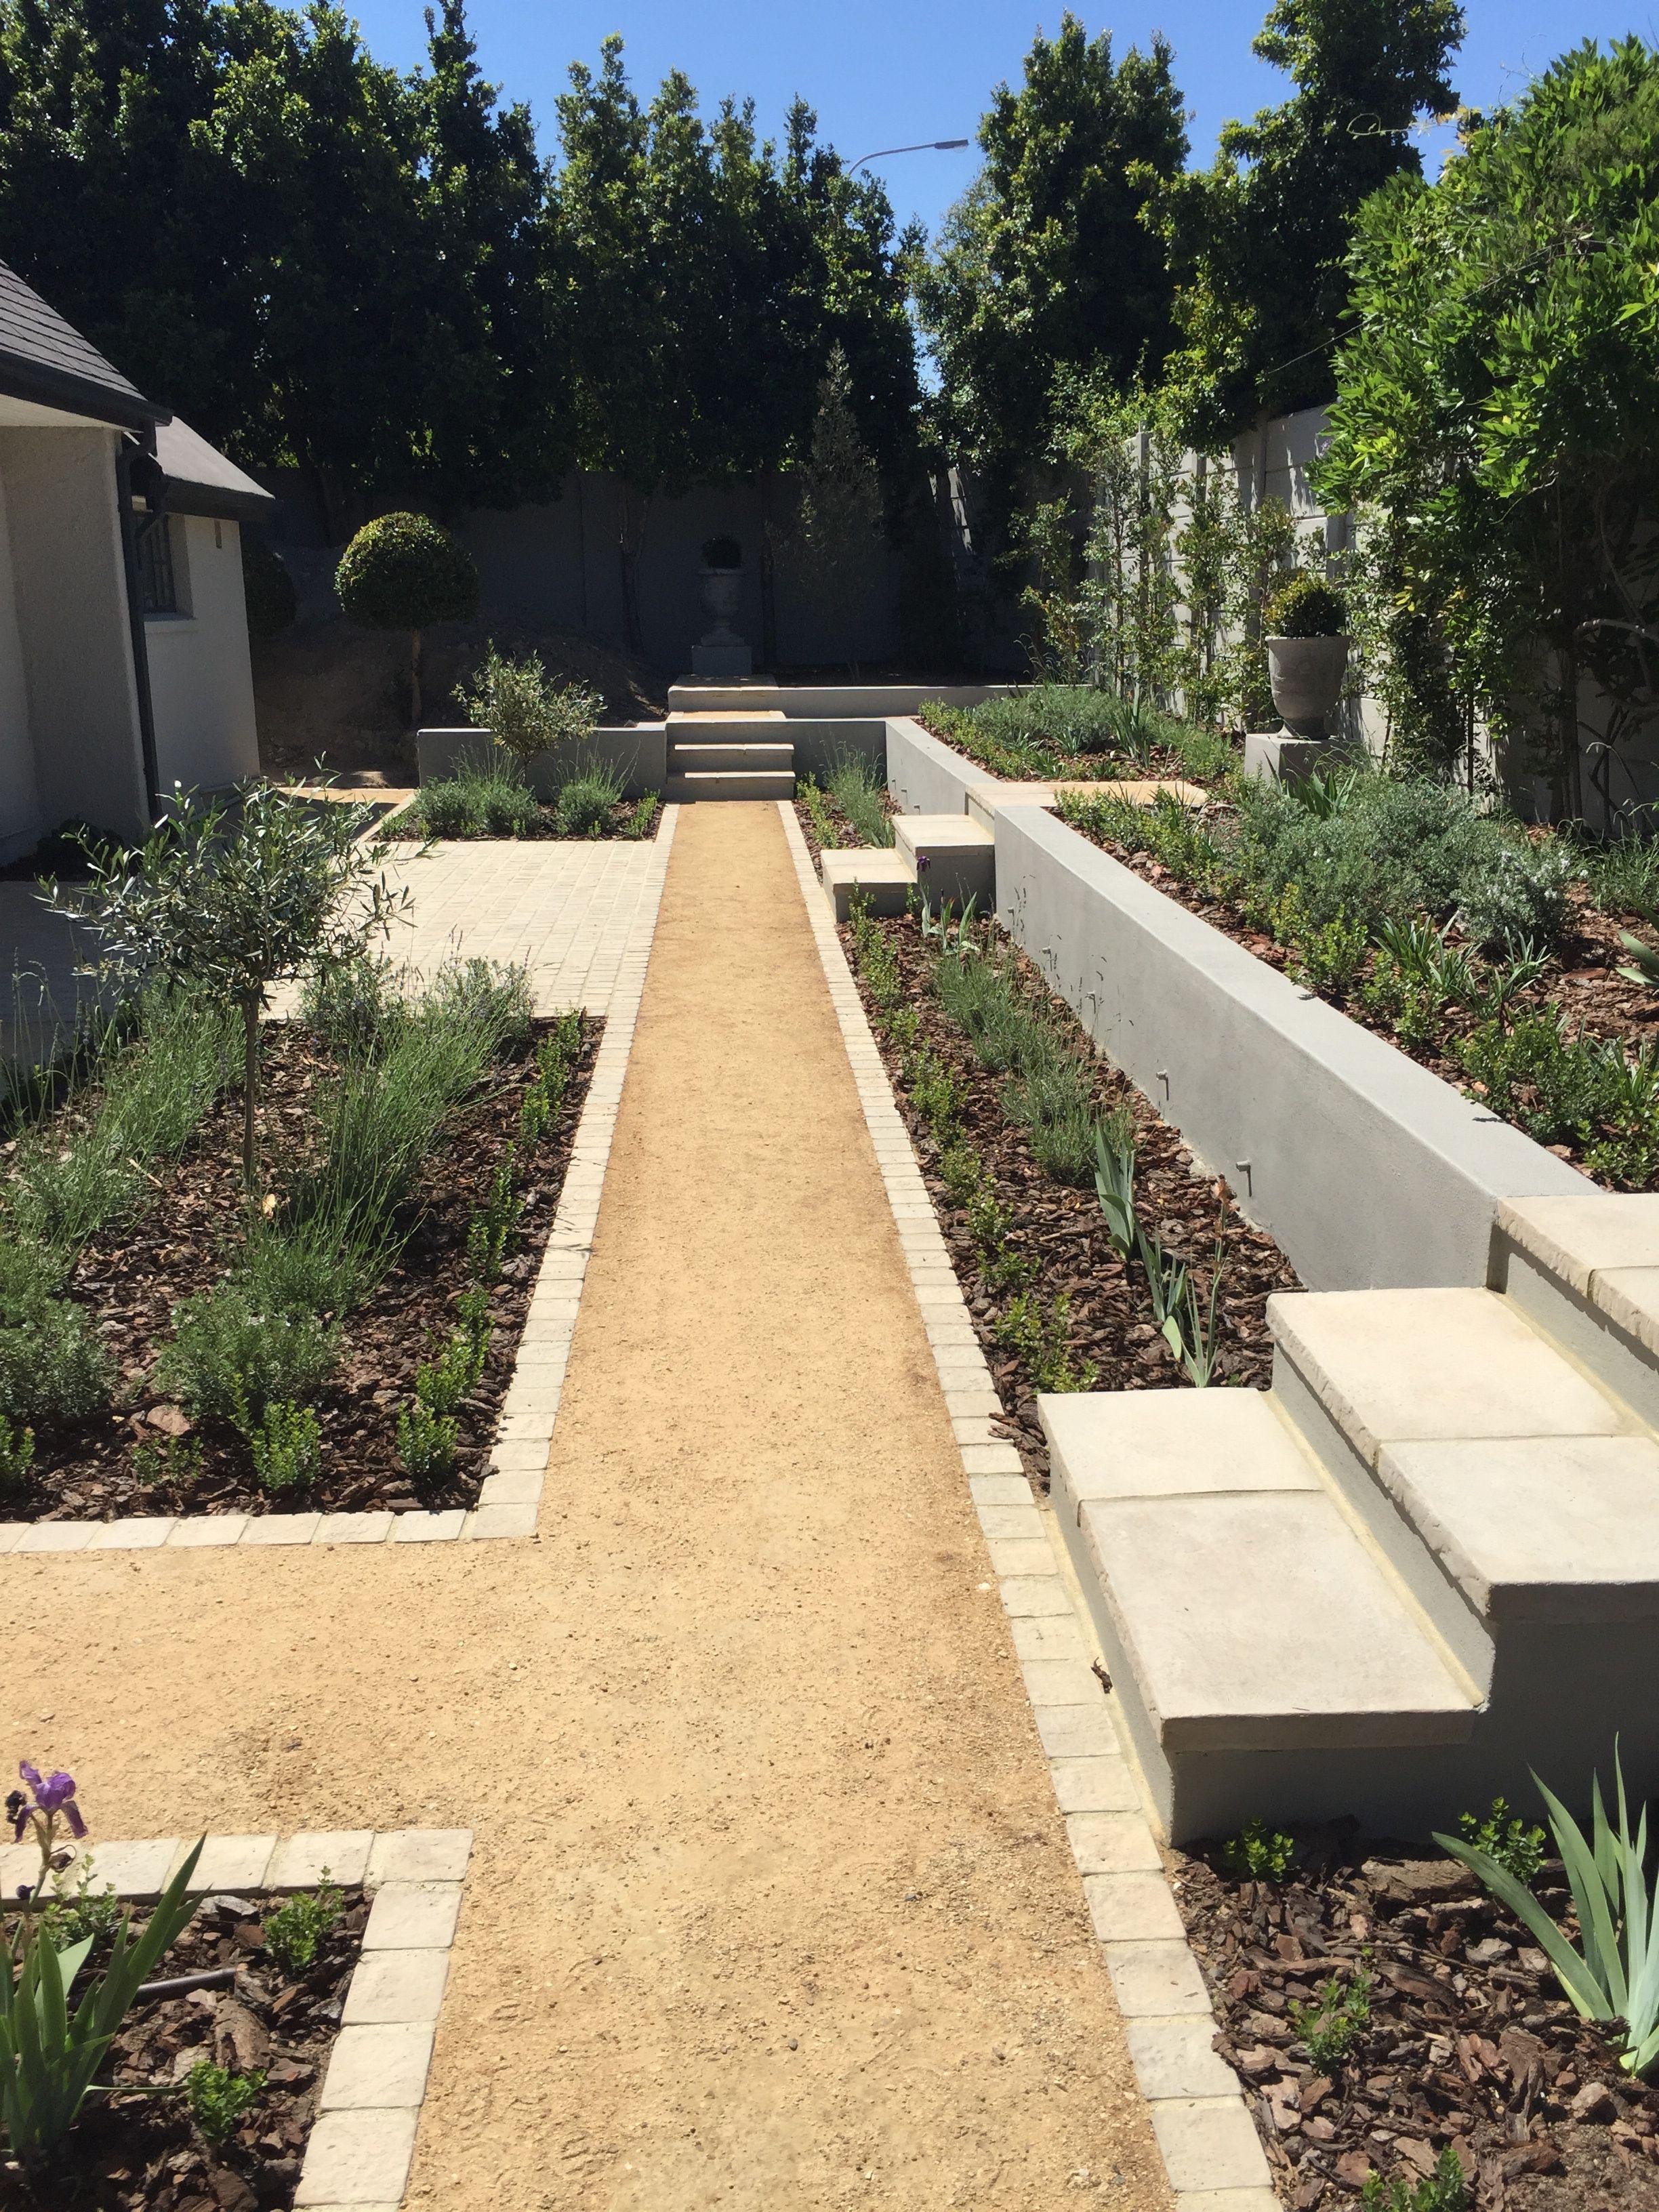 Cobble edged crusher dust pathway | House Boffa | Pinterest | Paving ...